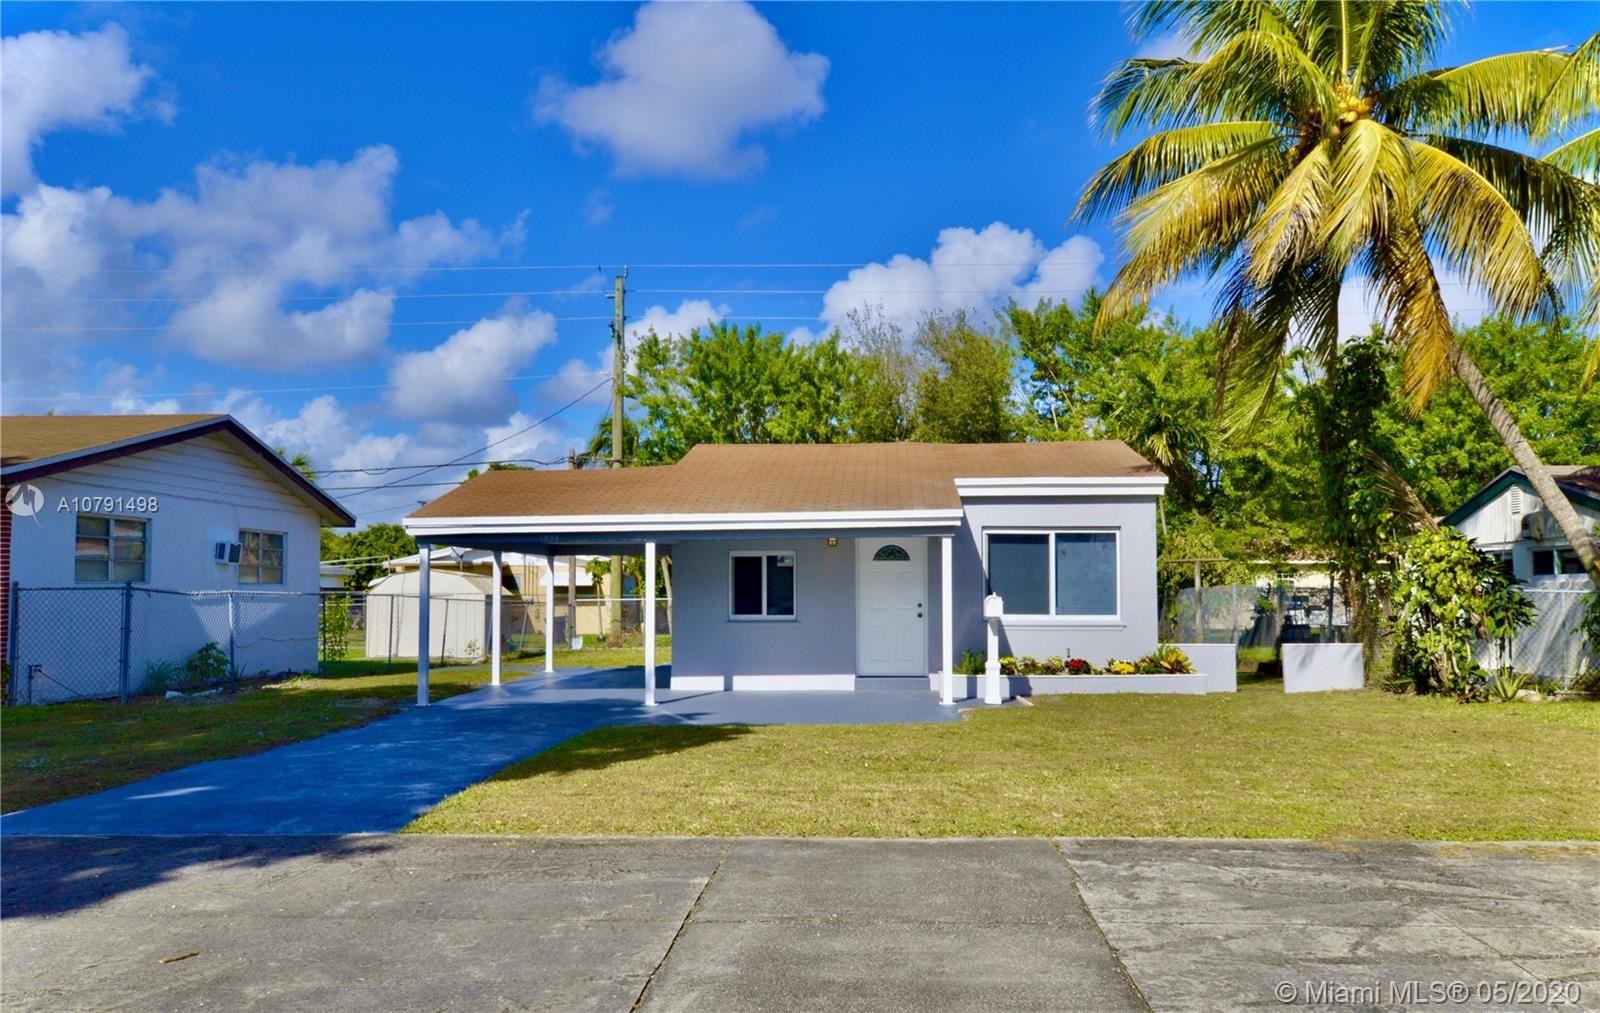 1855 NE 171st St, North Miami Beach, FL 33162 - MLS#: A10791498